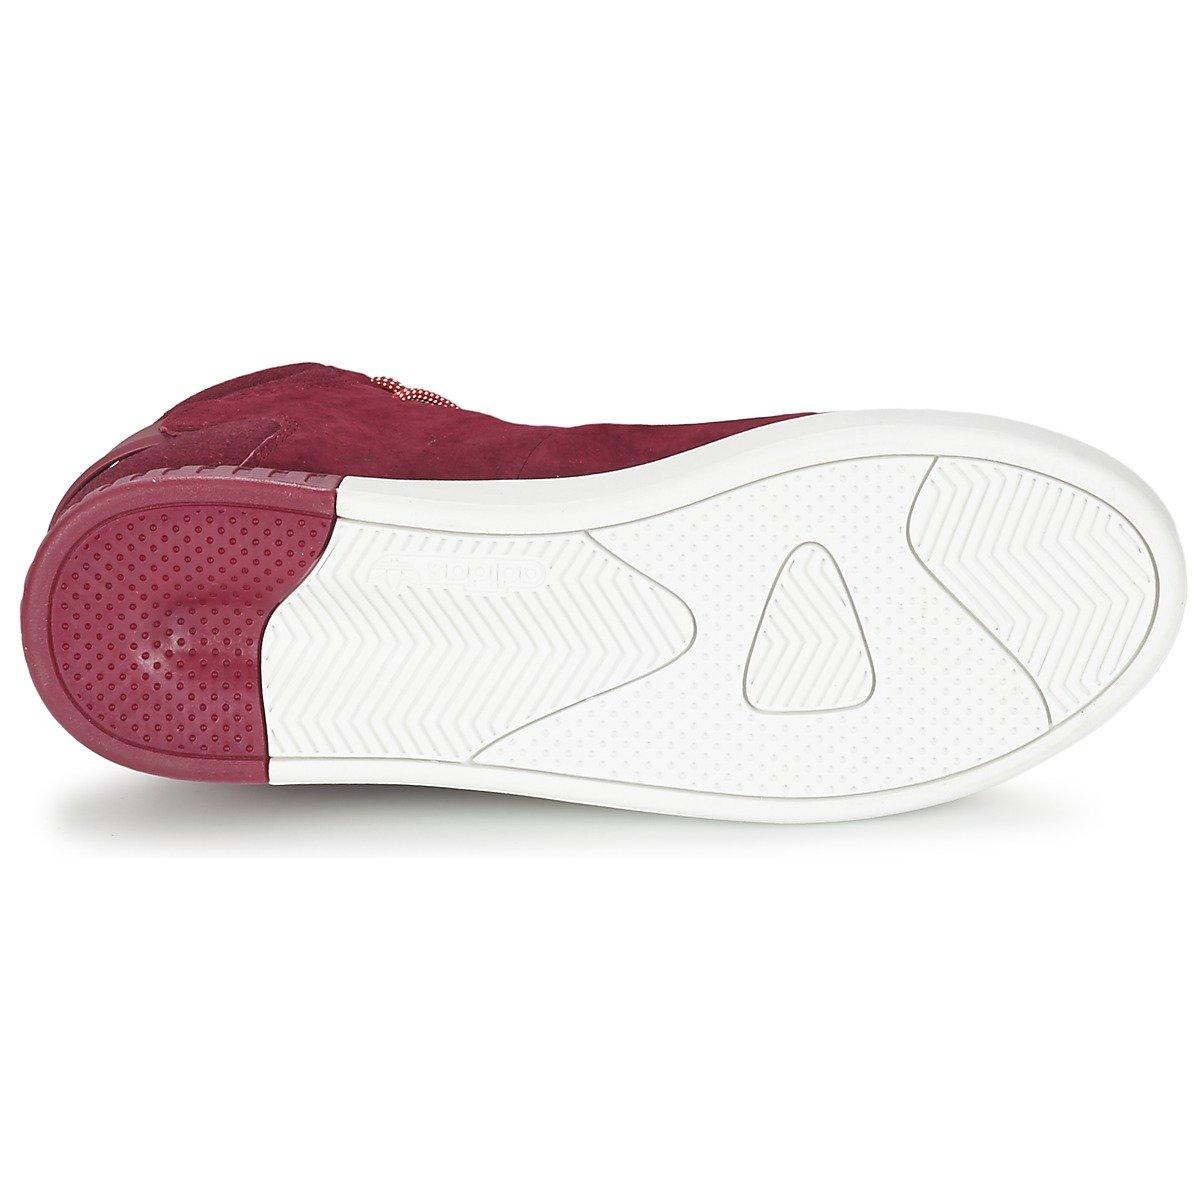 Bordeaux Tubular Invader Originals Montante Chaussures